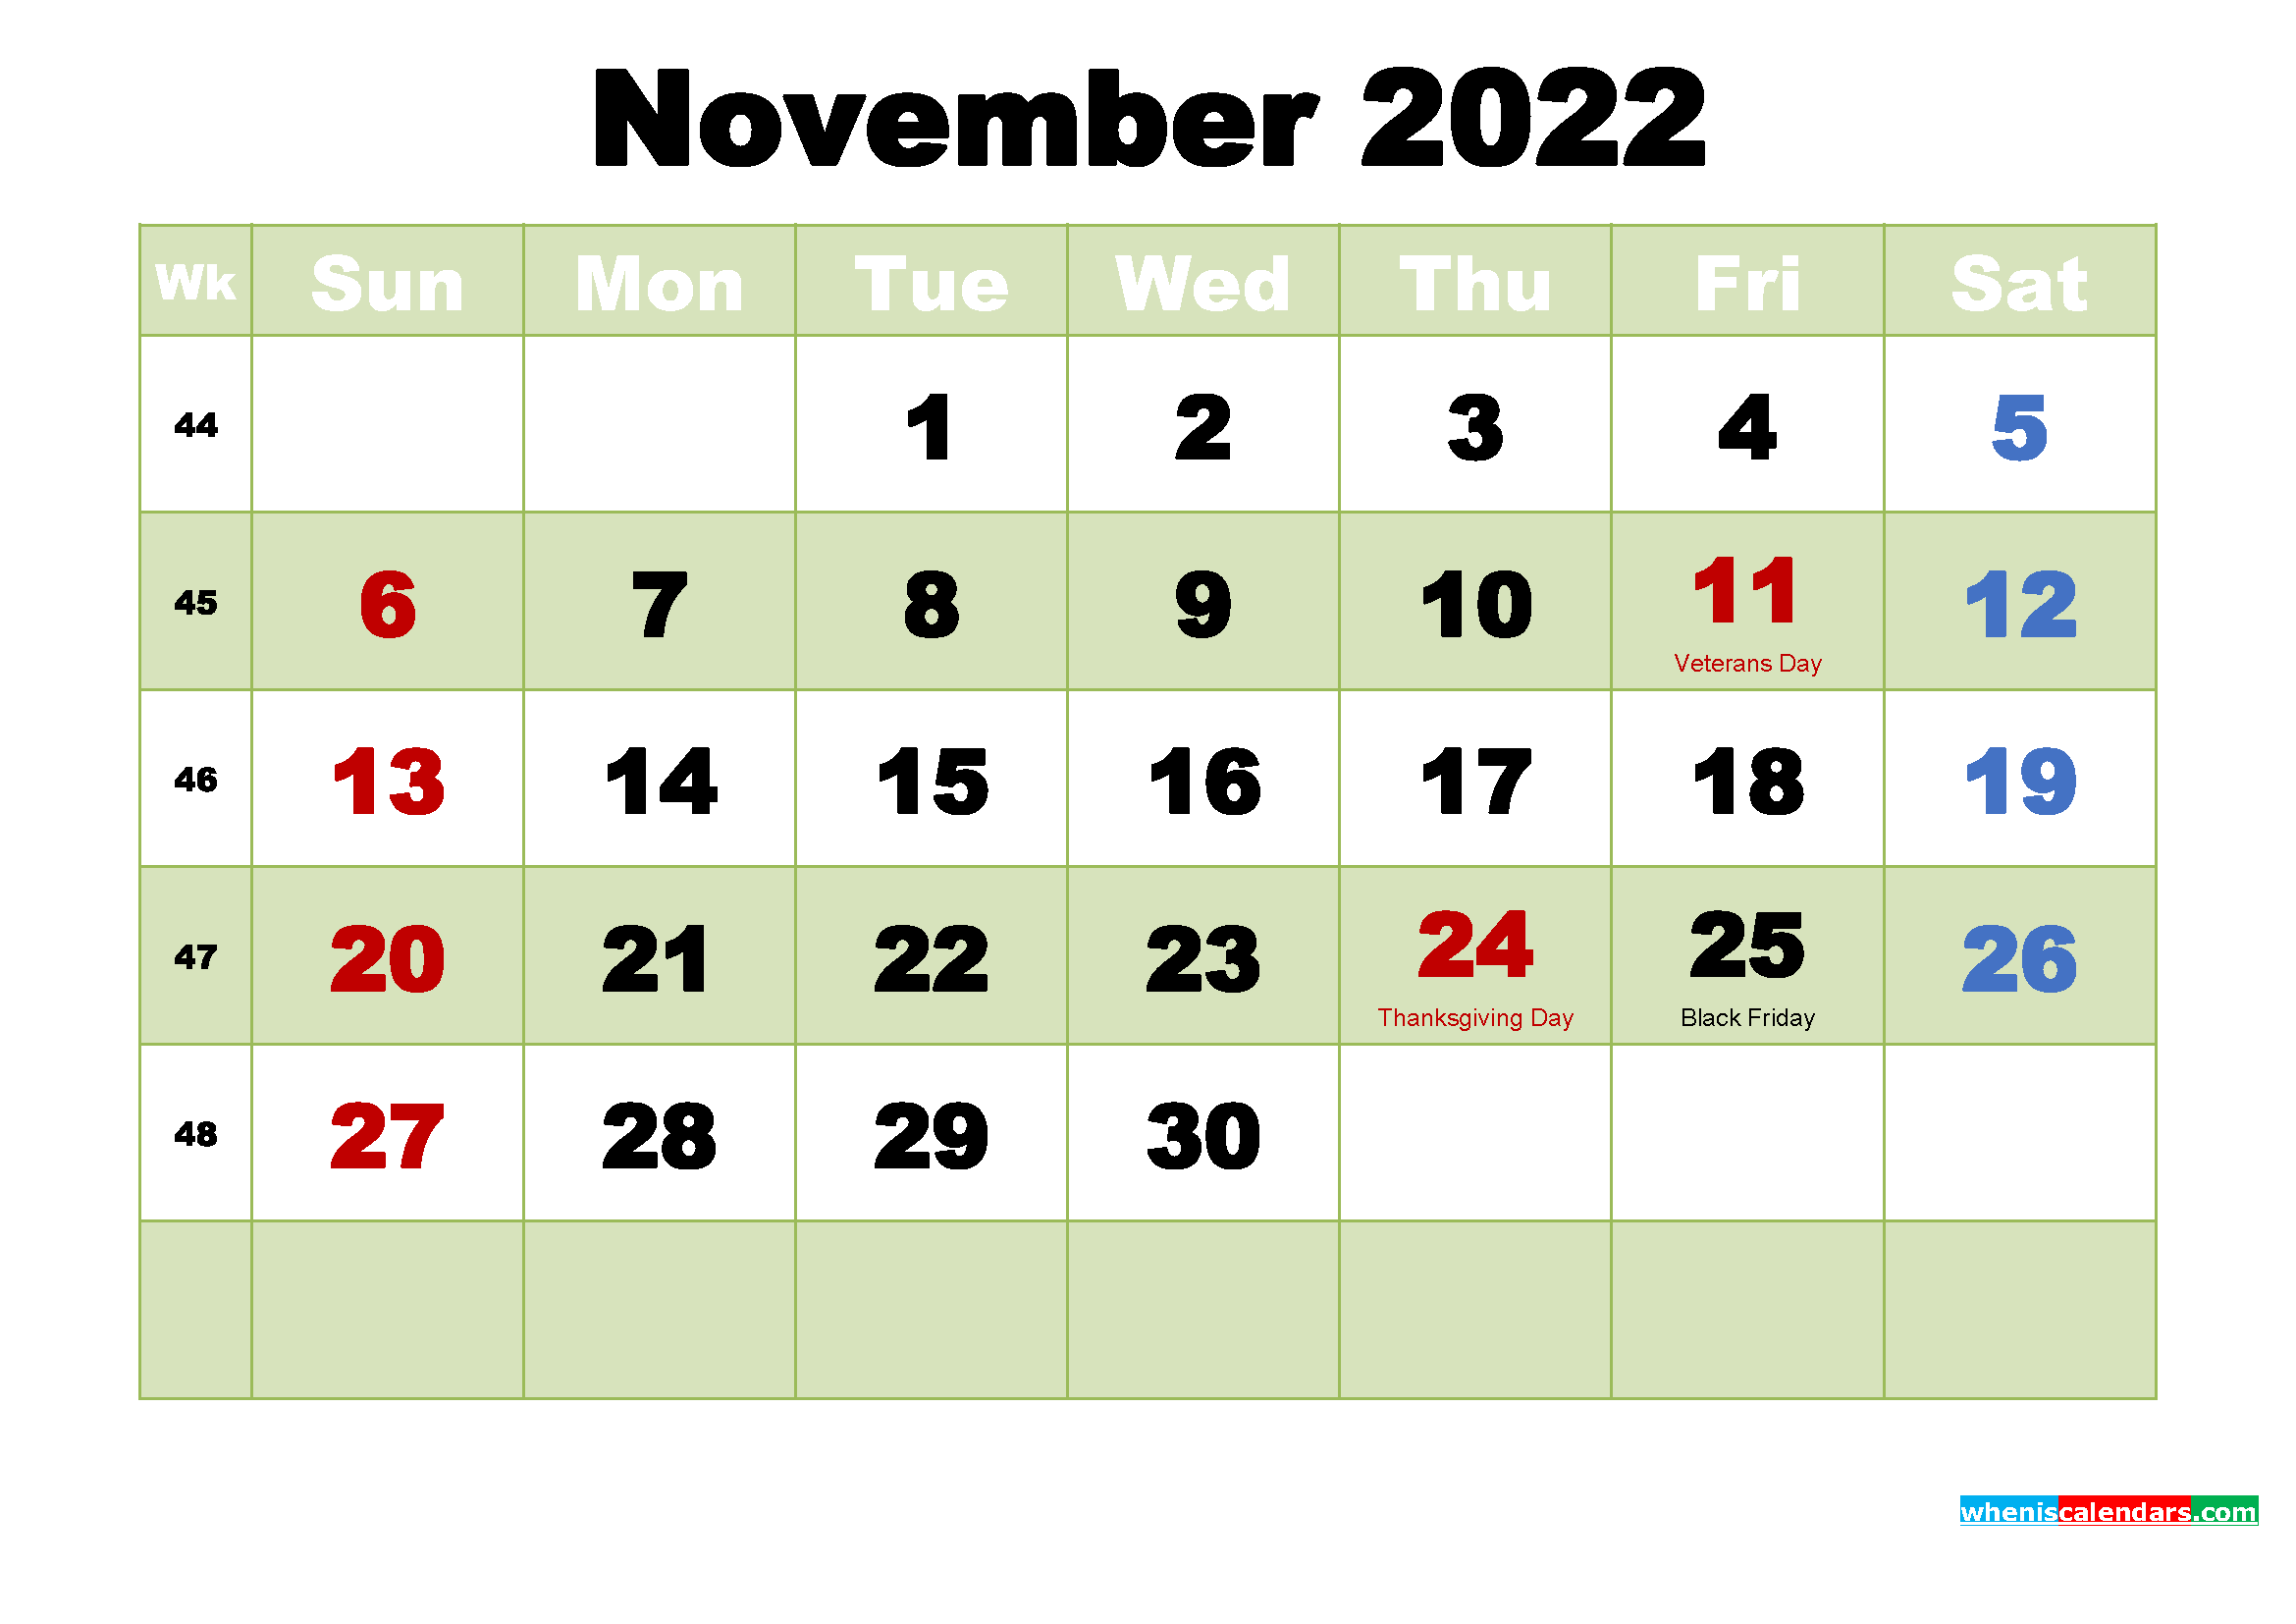 November 2022 Desktop Calendar Free Download